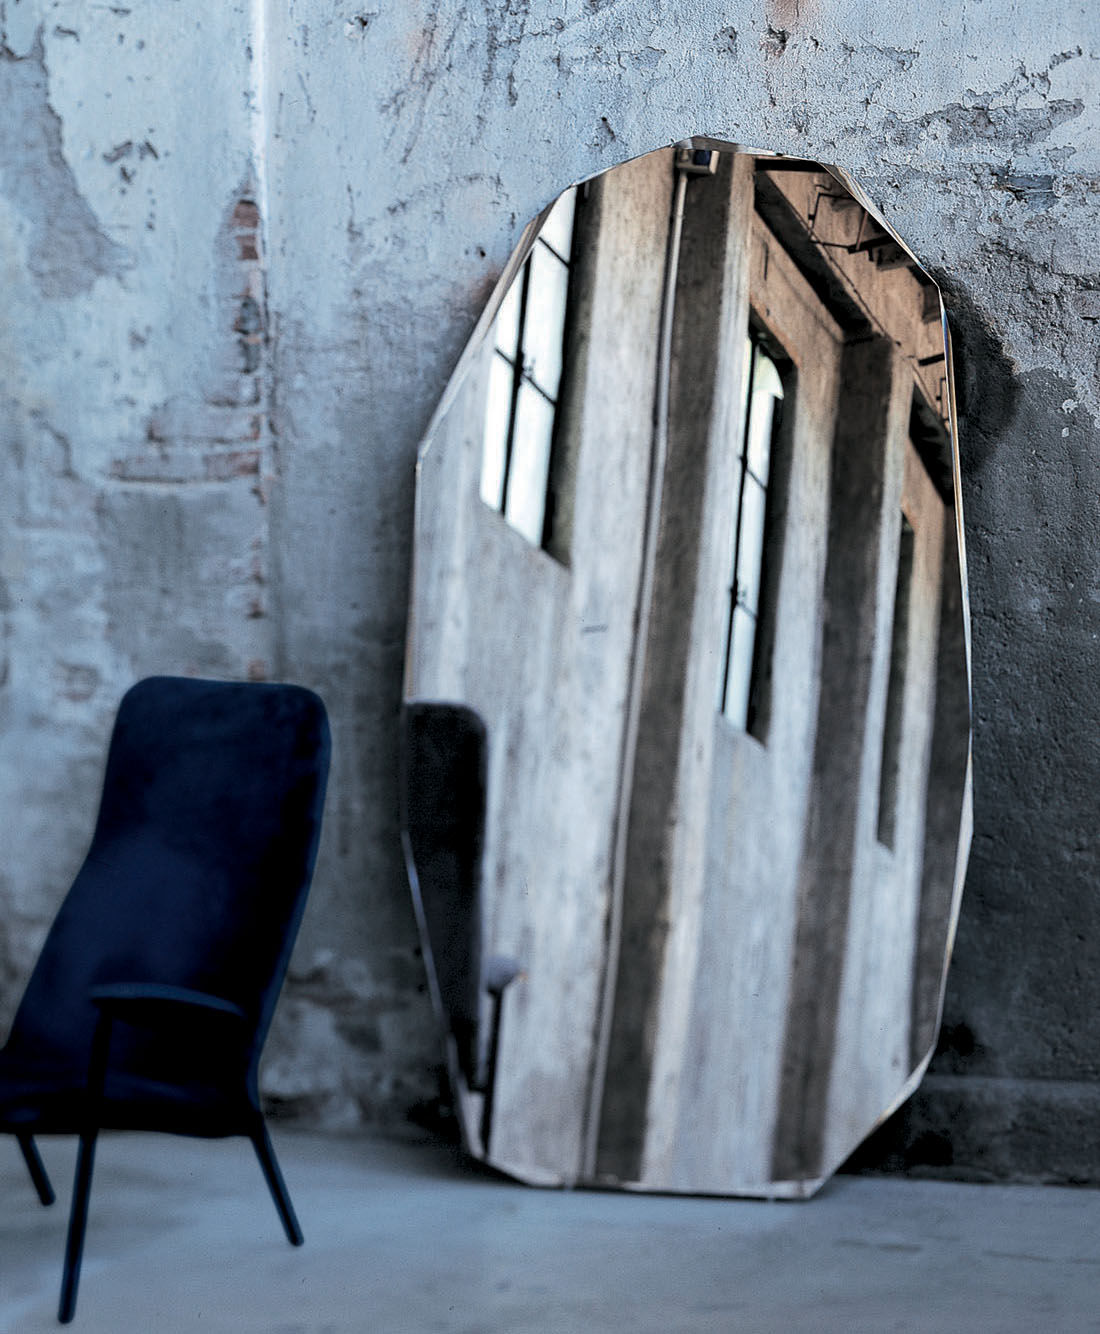 miroir poser kooh i noor glas italia miroir l 116 x. Black Bedroom Furniture Sets. Home Design Ideas